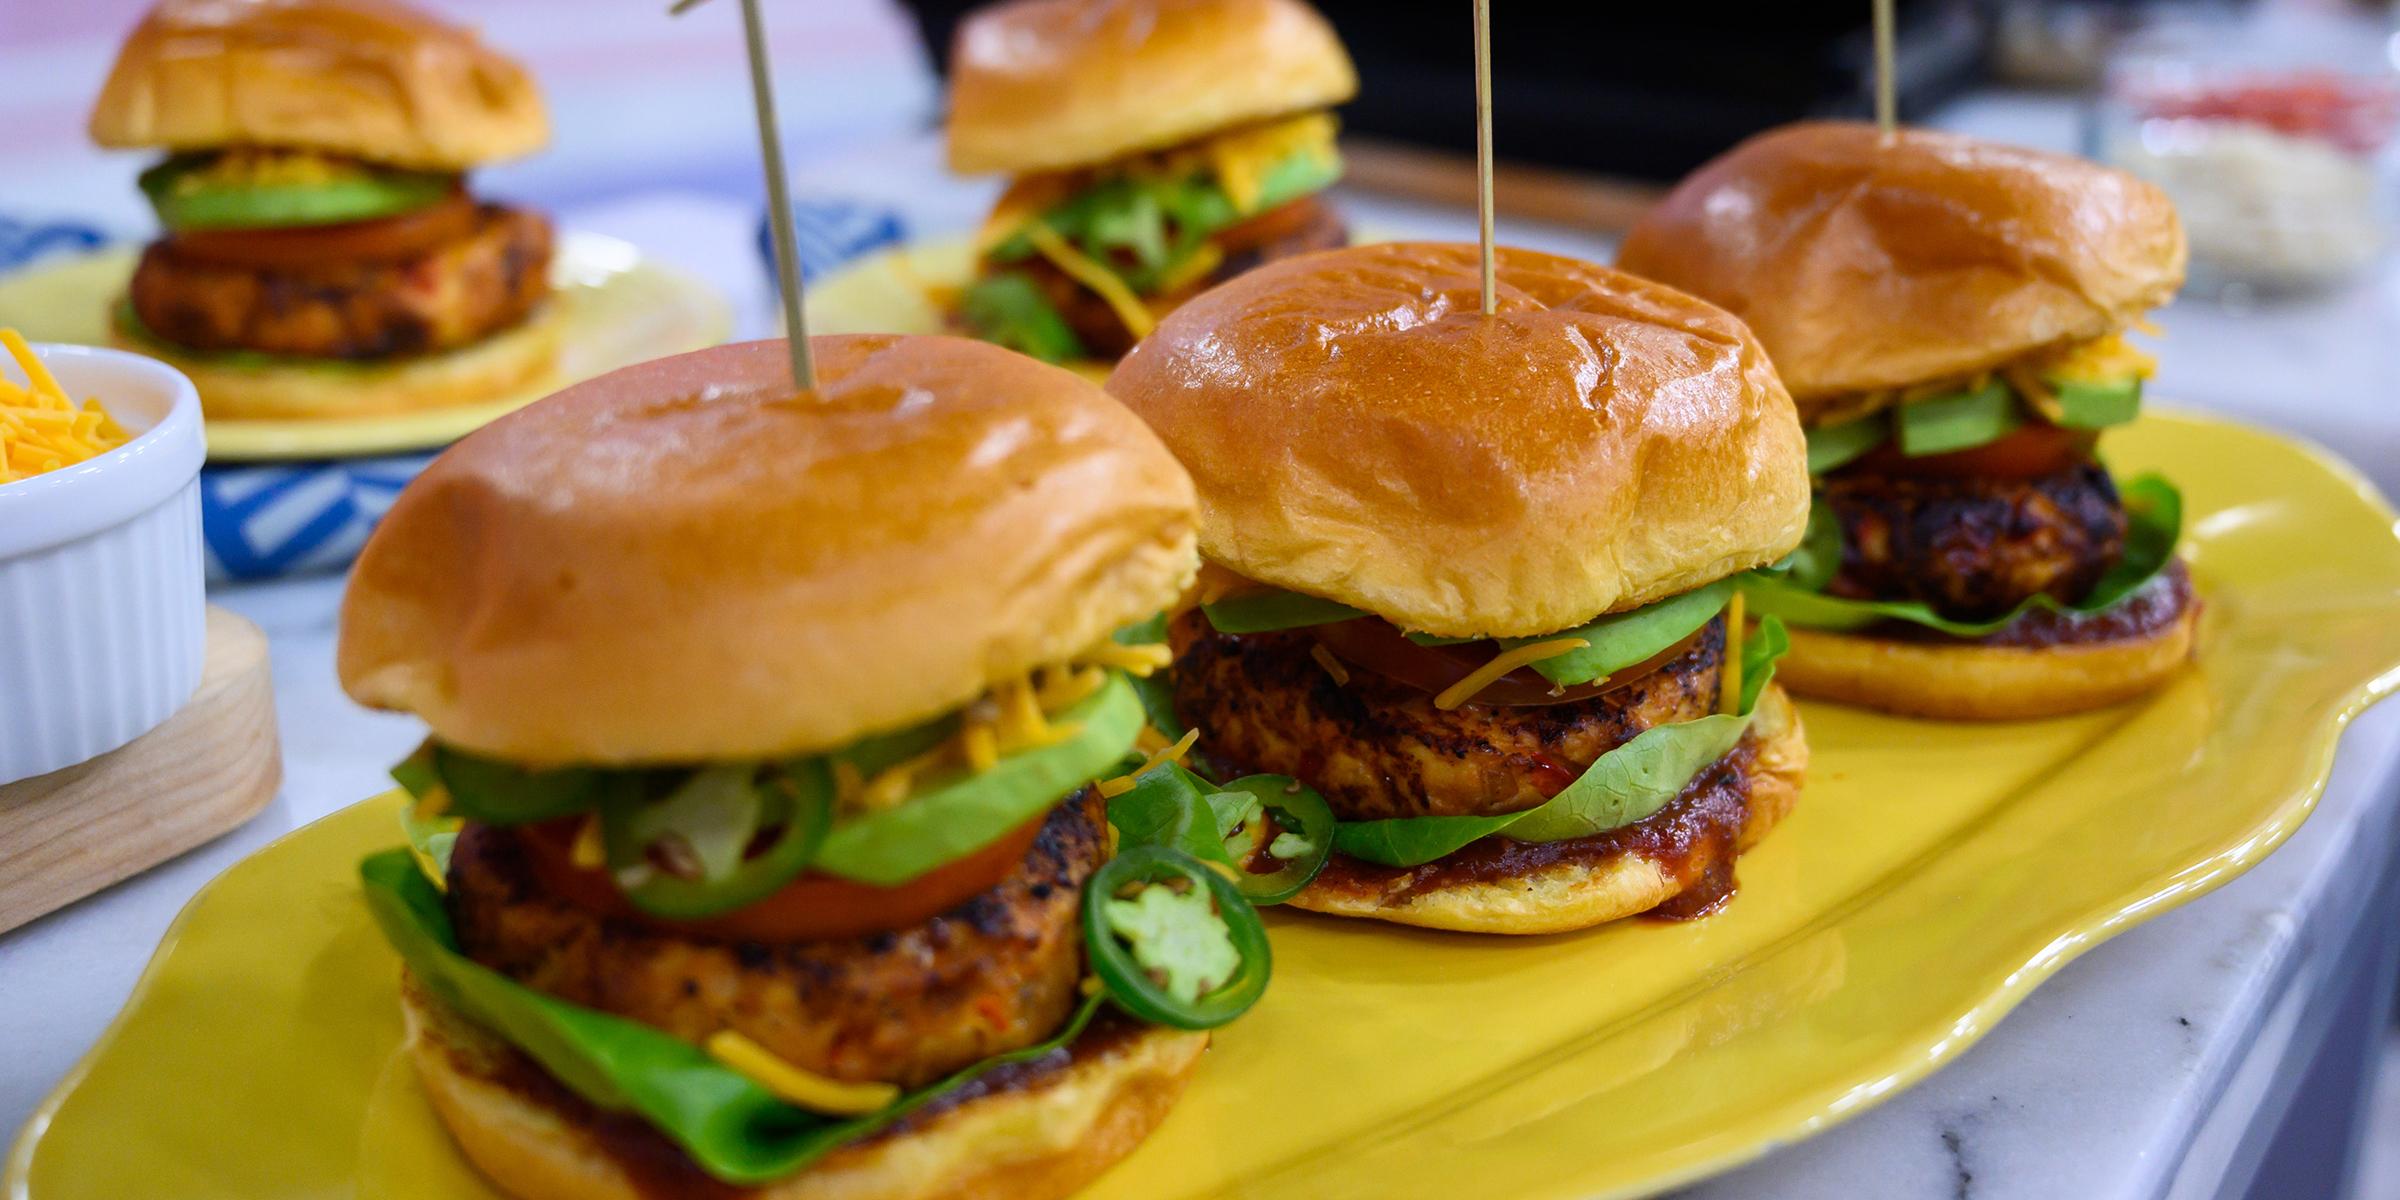 Siri Daly S Chicken Burgers Today Com